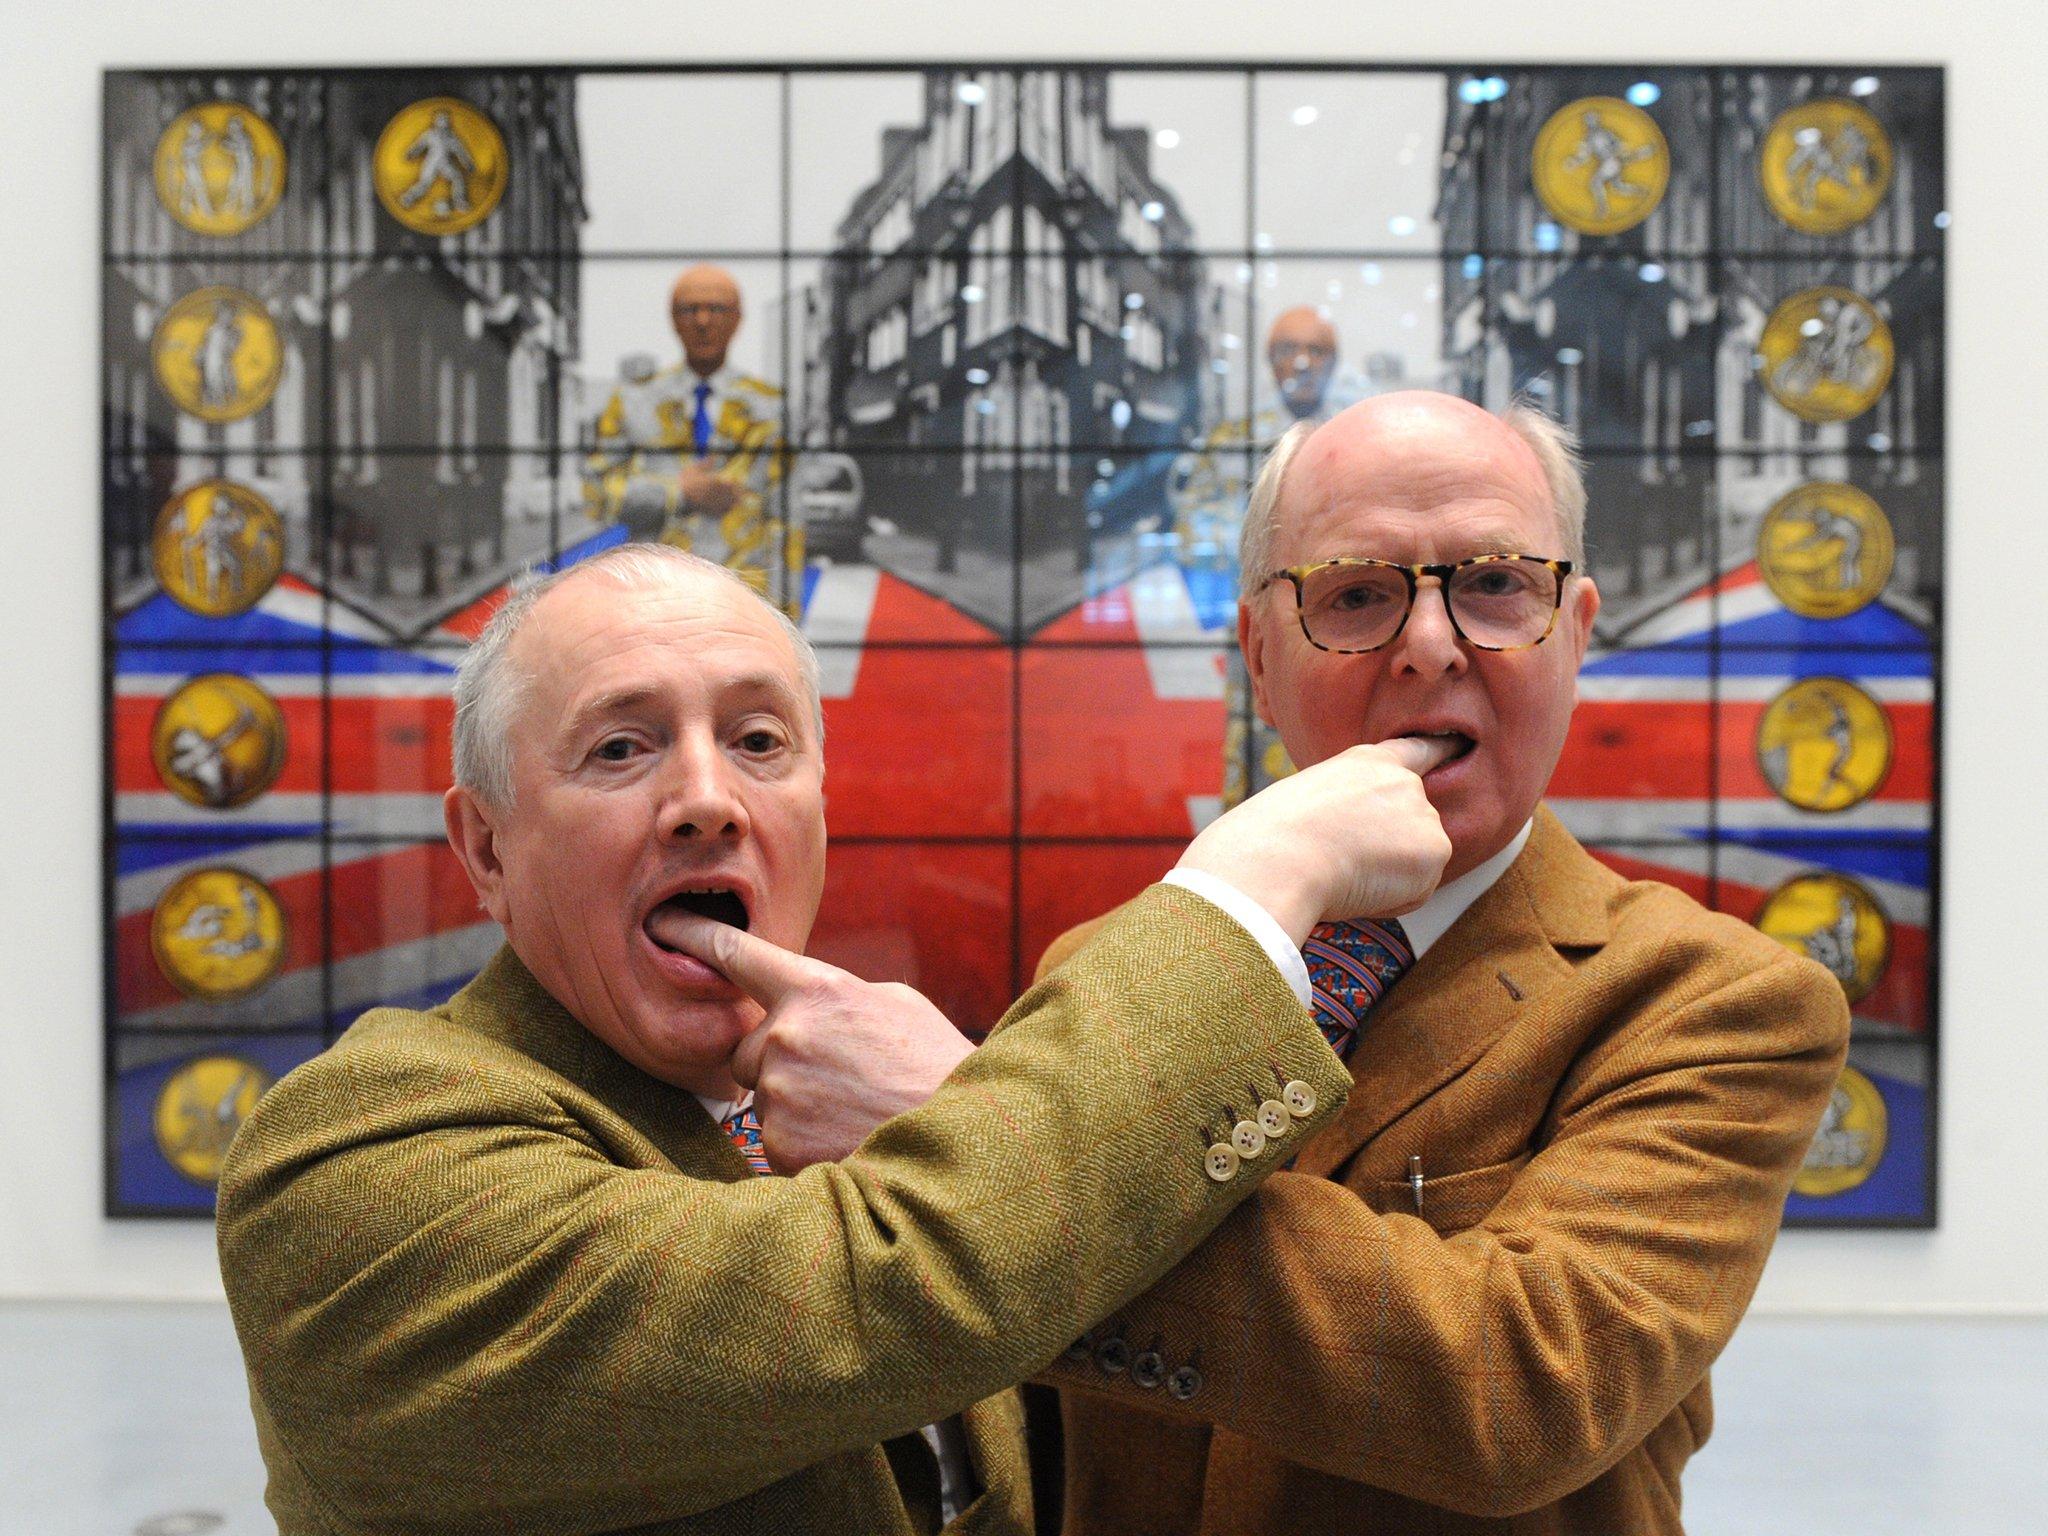 15,000 objects on show as Brafa art fair returns